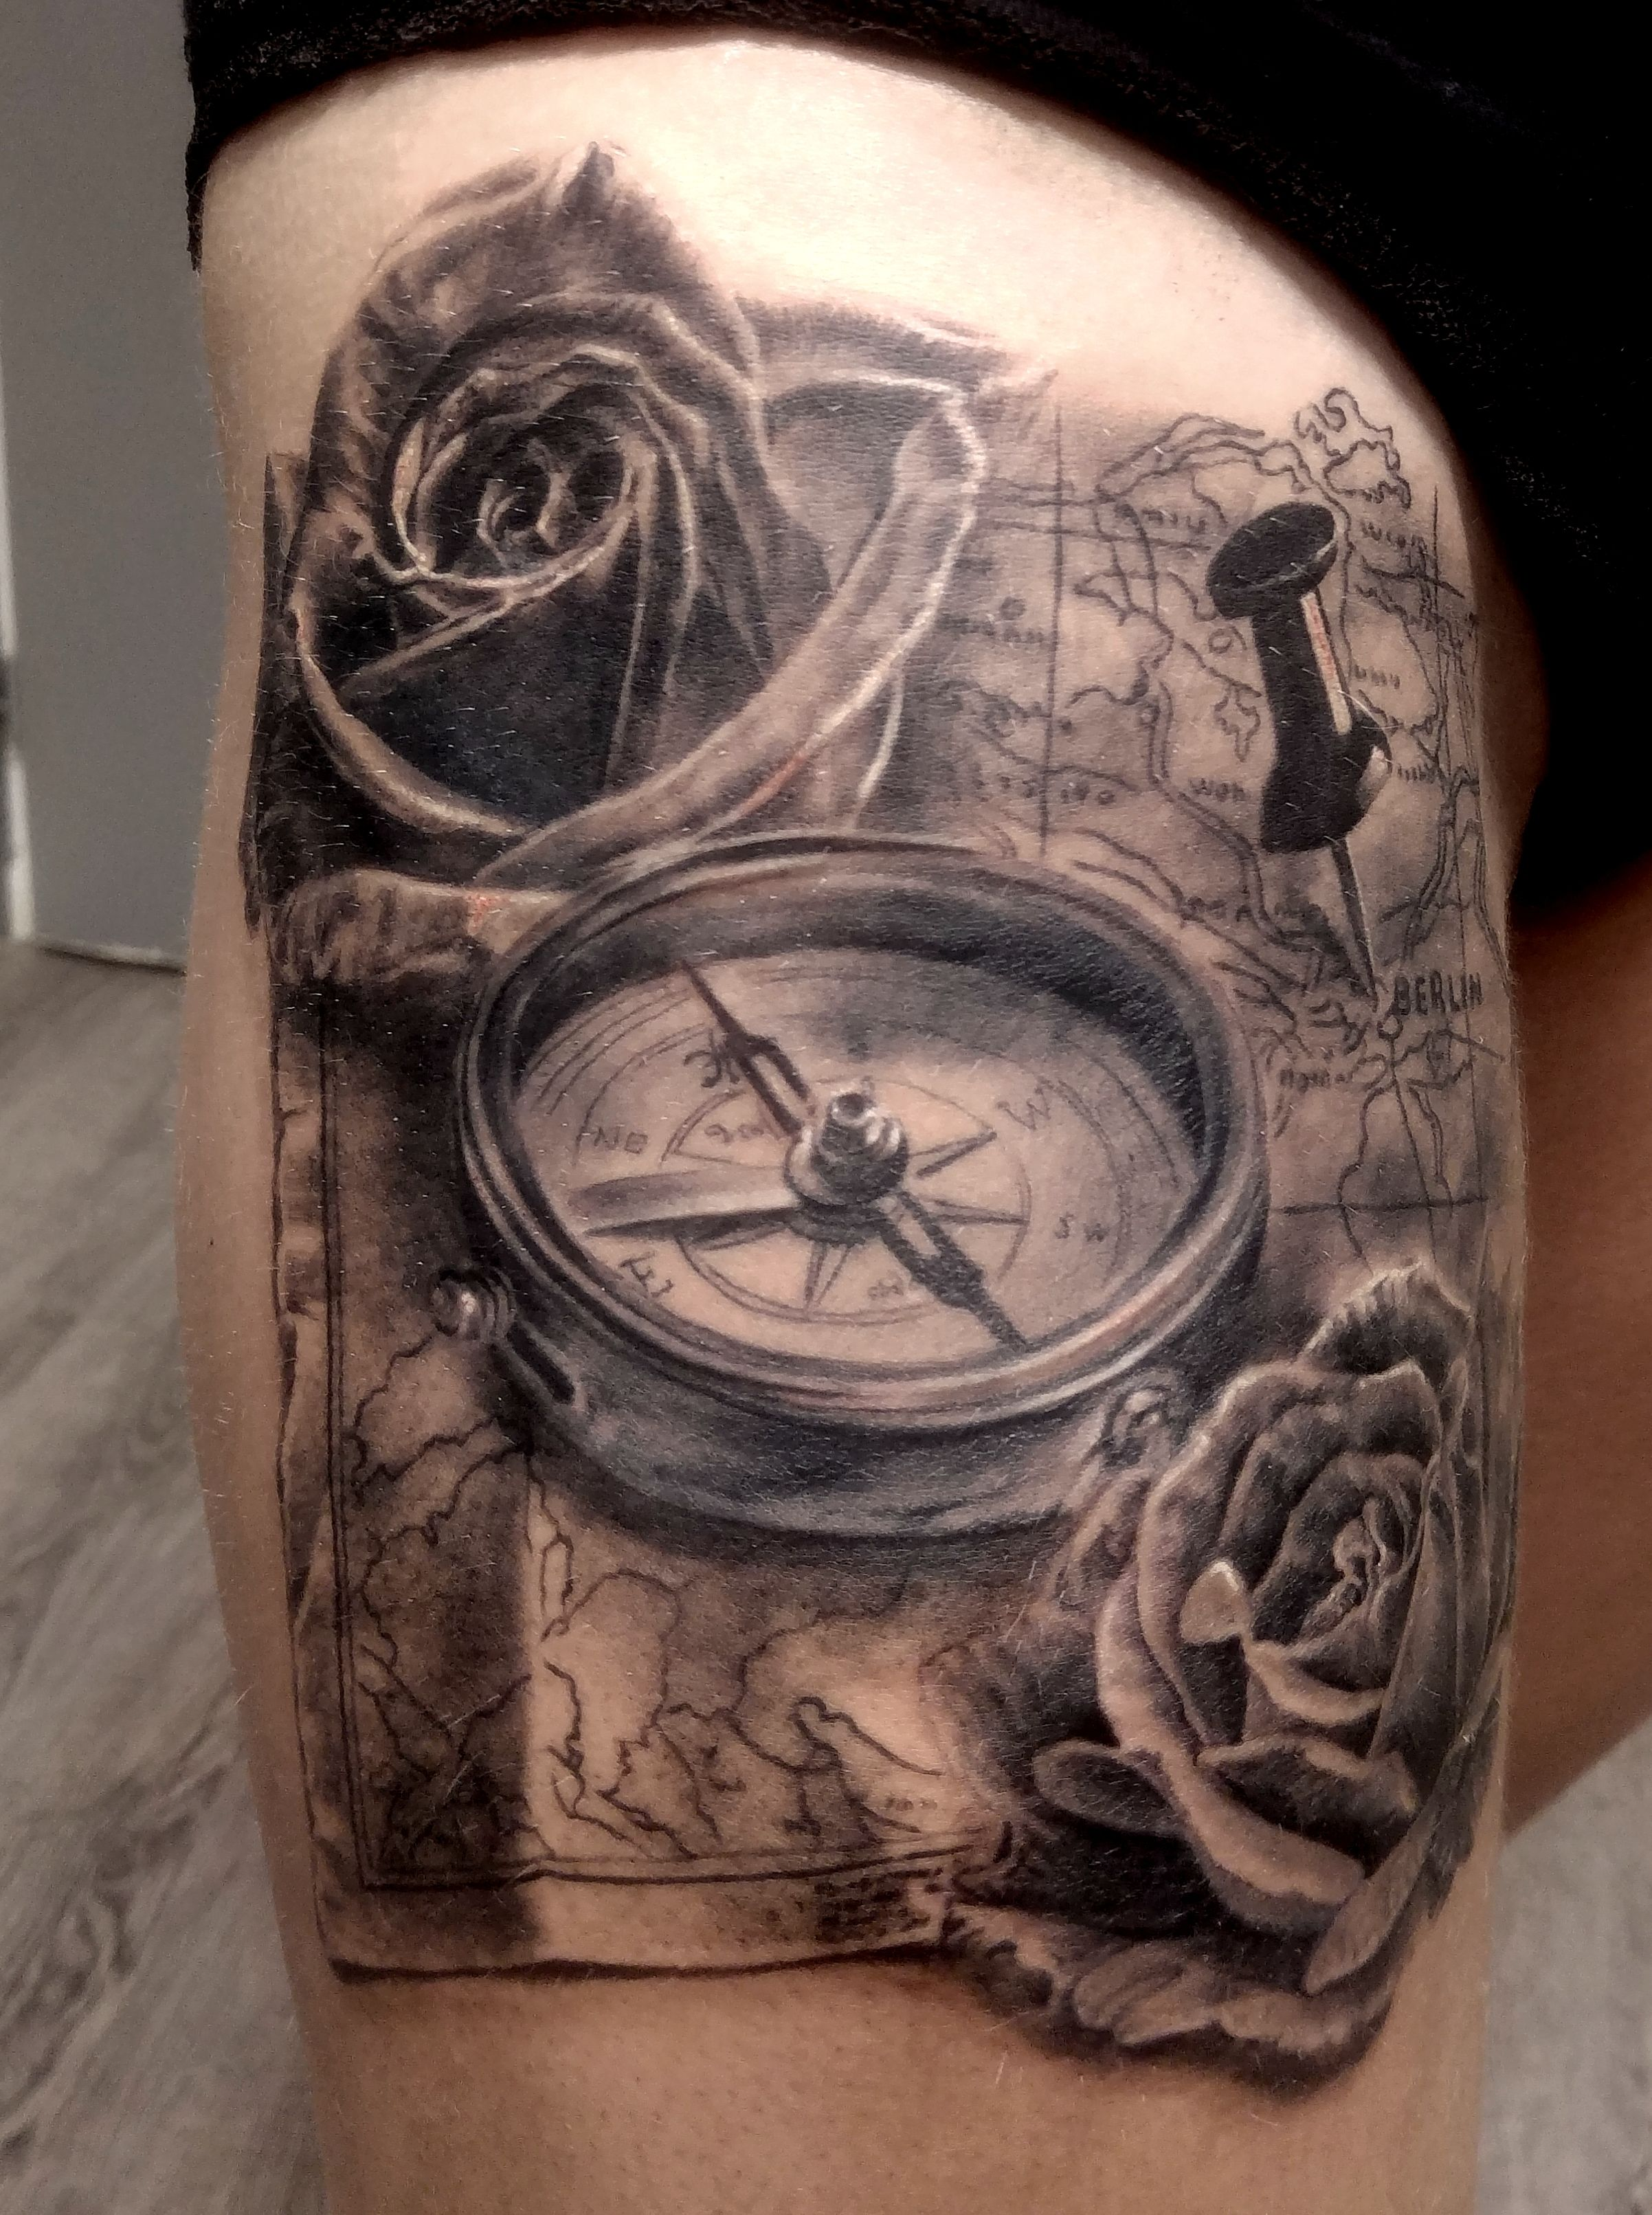 Tatouage roses carte boussole par stephane bueno tatoueur studio black corner tattoo rose - Tatouage homme boussole ...